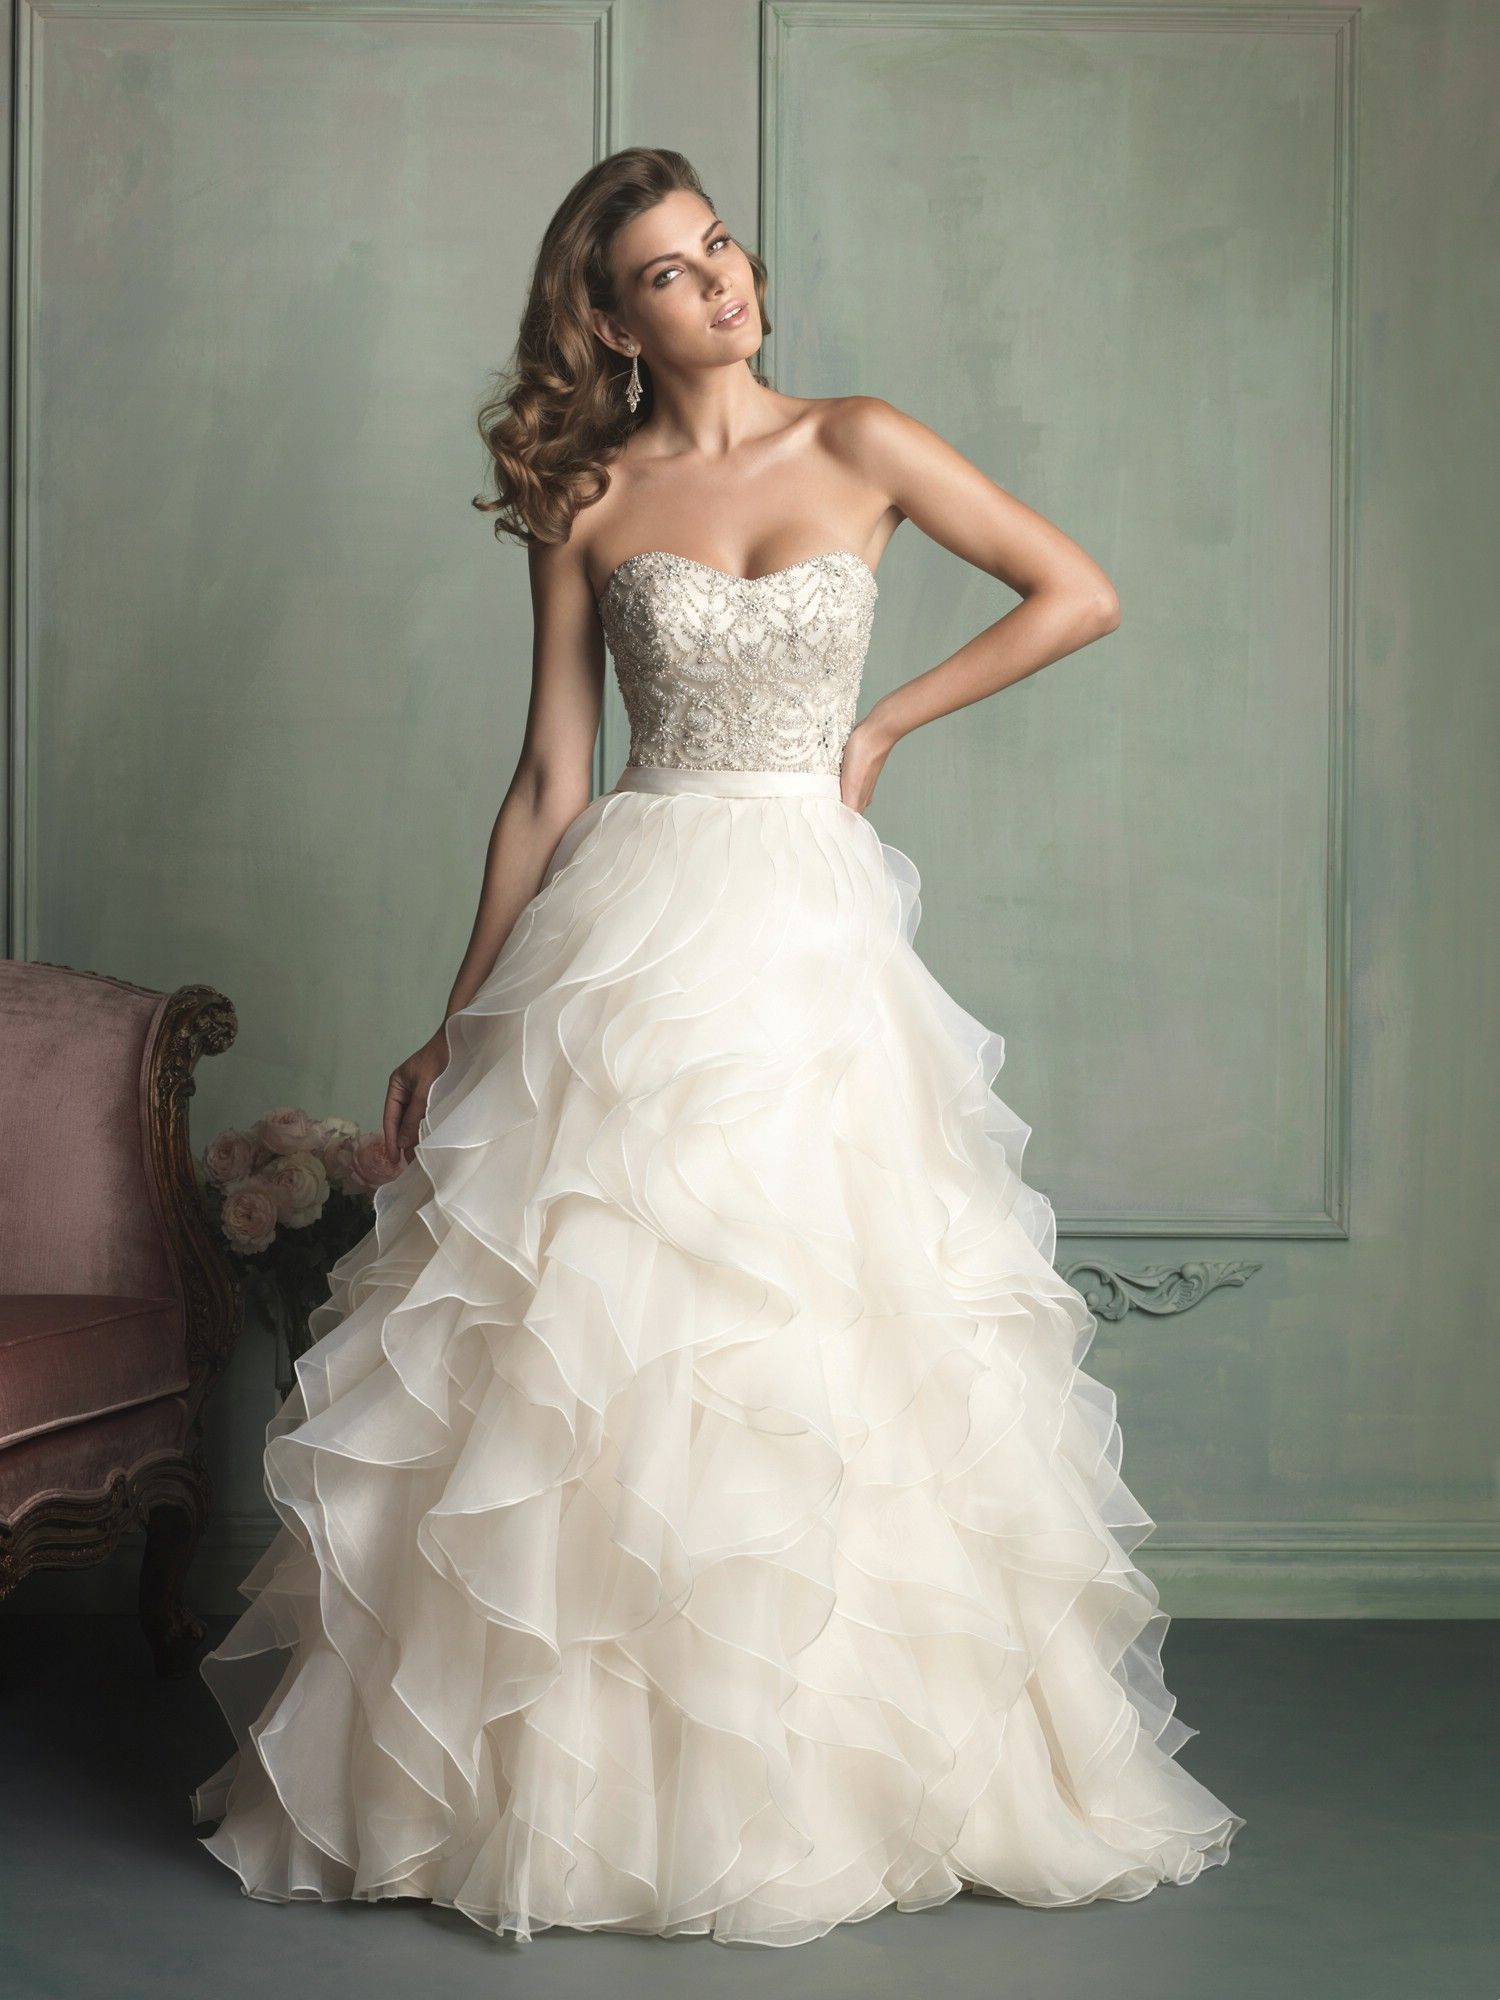 Wedding Dress Styles 2014